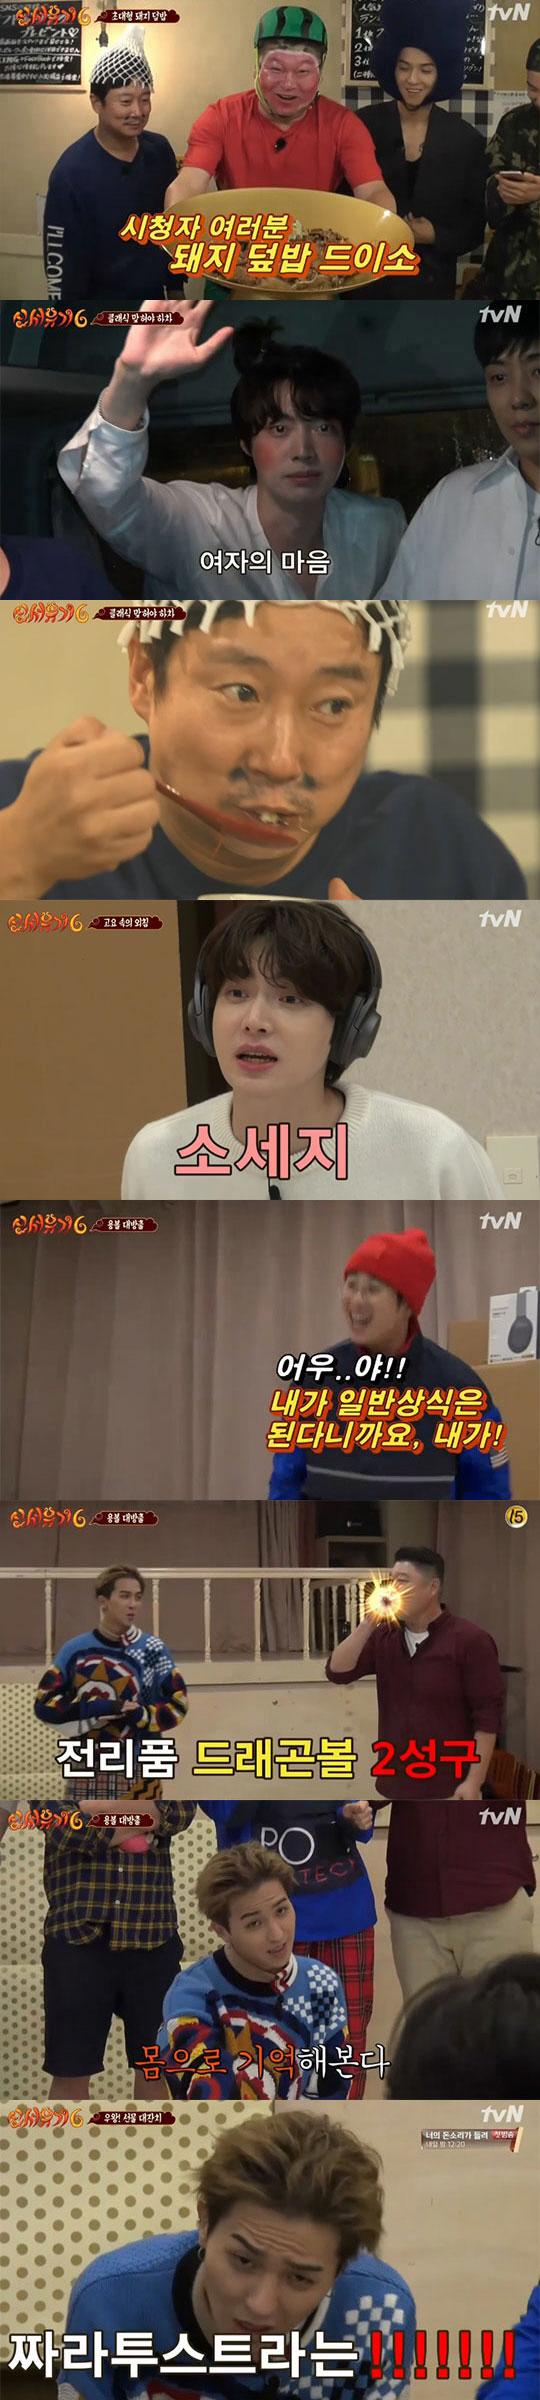 Eunyouwon = actor subject